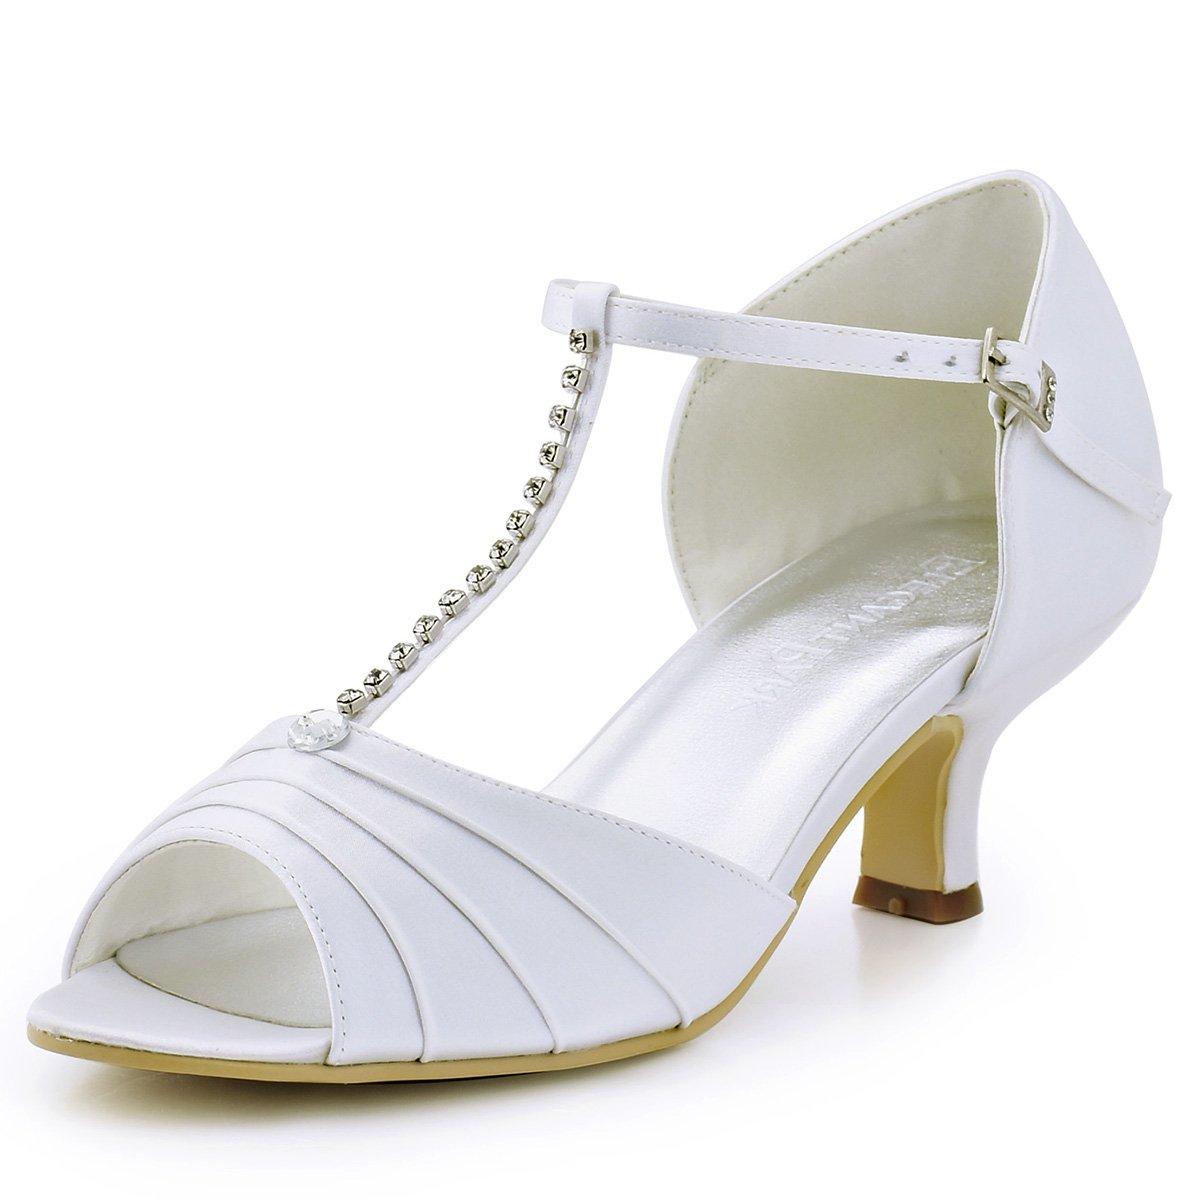 84da641573e ElegantPark ElegantPark ElegantPark EL-035 Women Peep Toe T-Strap Pumps Mid Heel  Rhinestones Satin Evening Wedding Bridal Sandals B00AWO65A8 6 B(M) US (true  ...